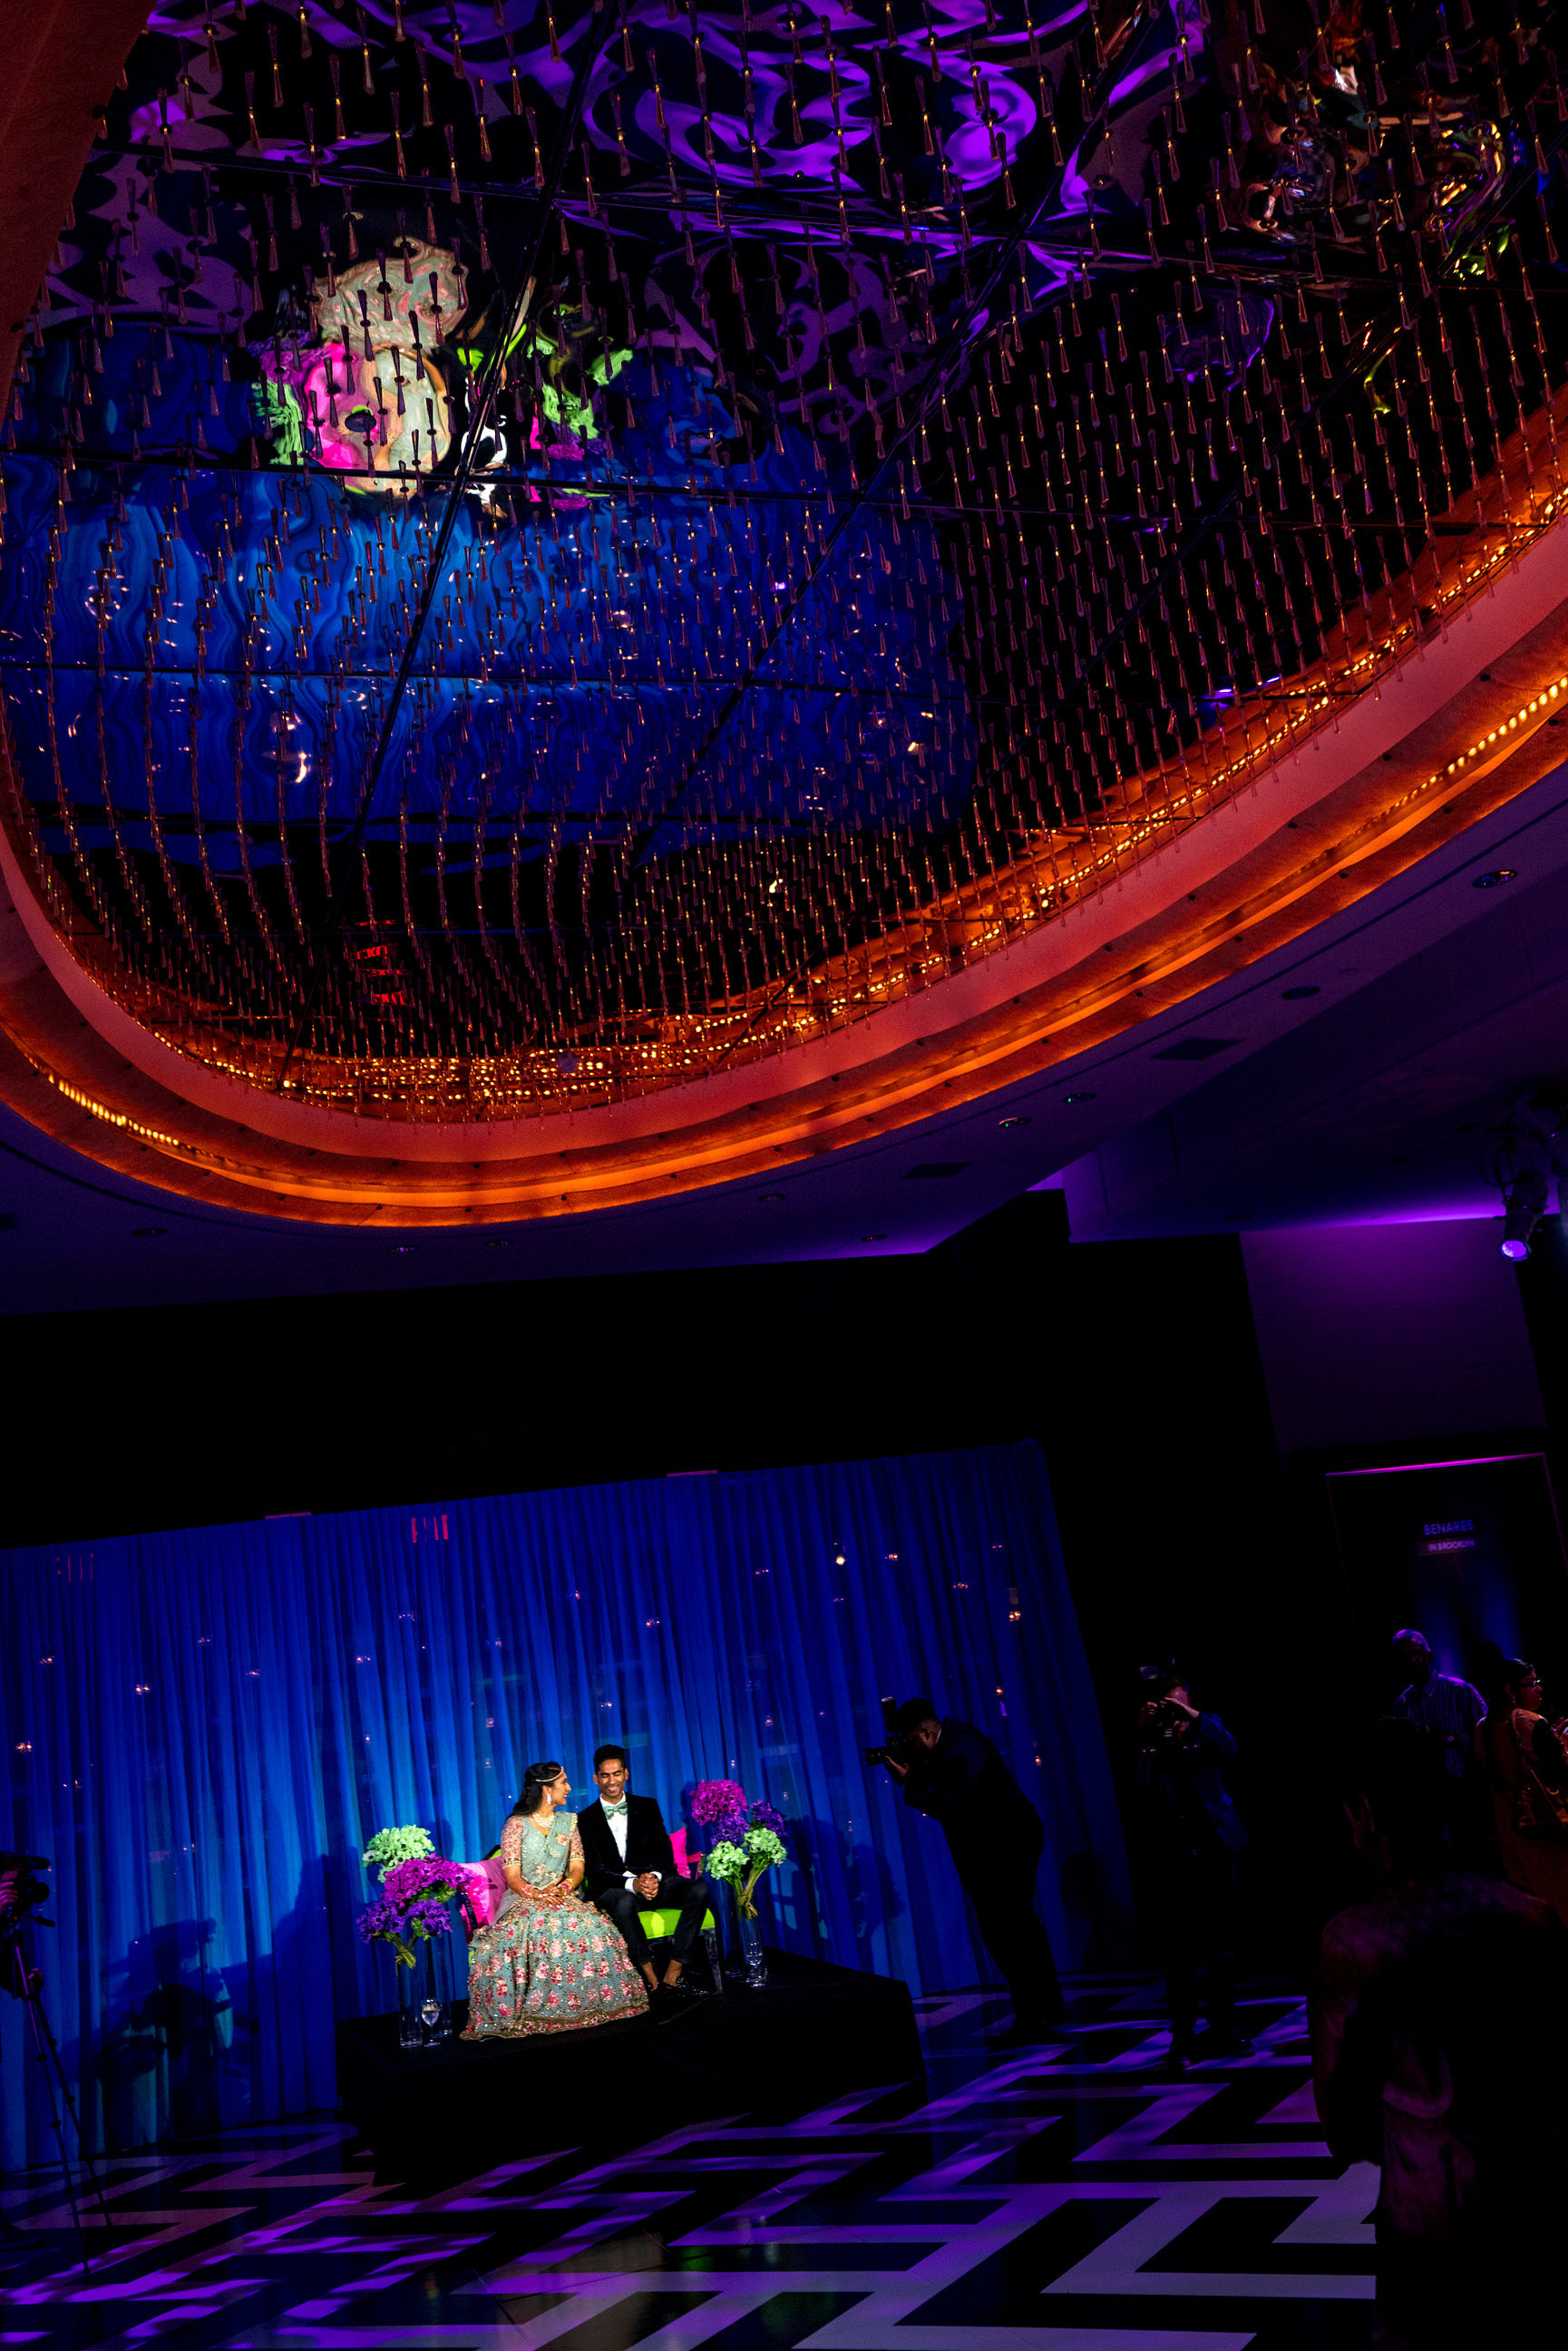 INDIAN WEDDING VENUE NEON DECOR.JPG